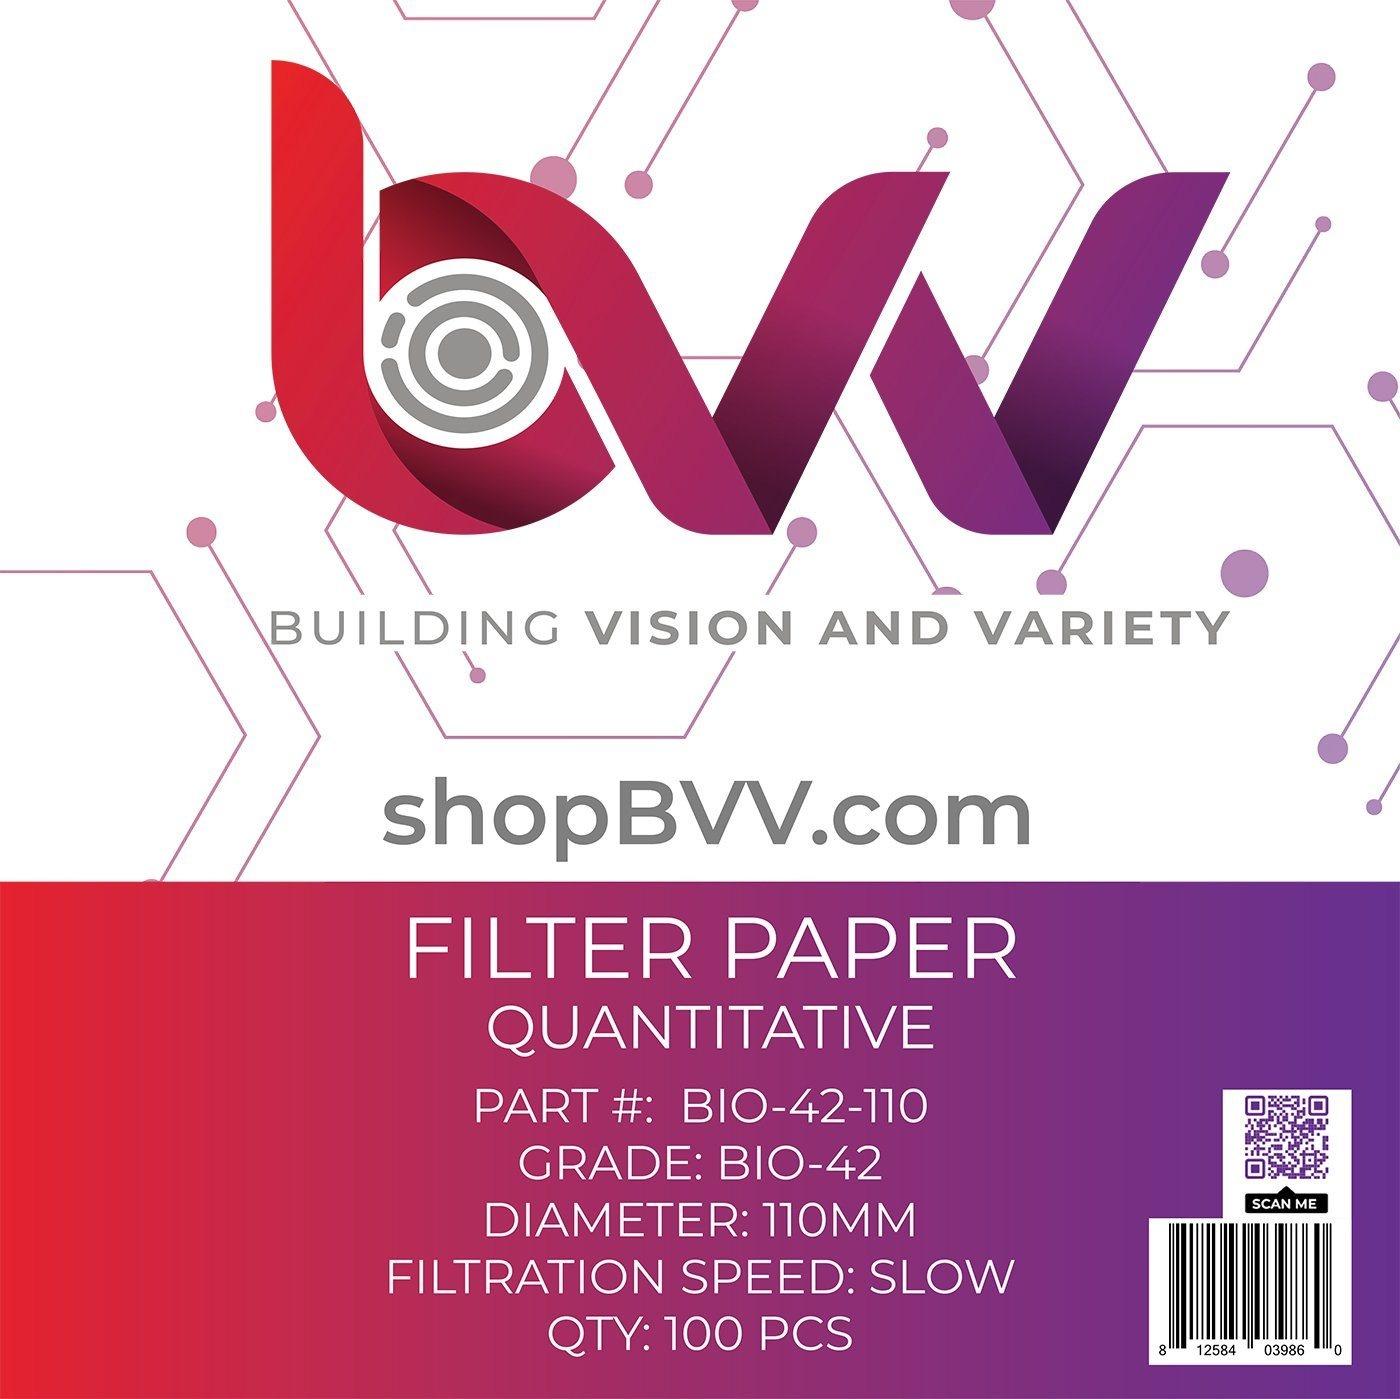 Generic Ashless Filter Papers - 110MM - Quantitative